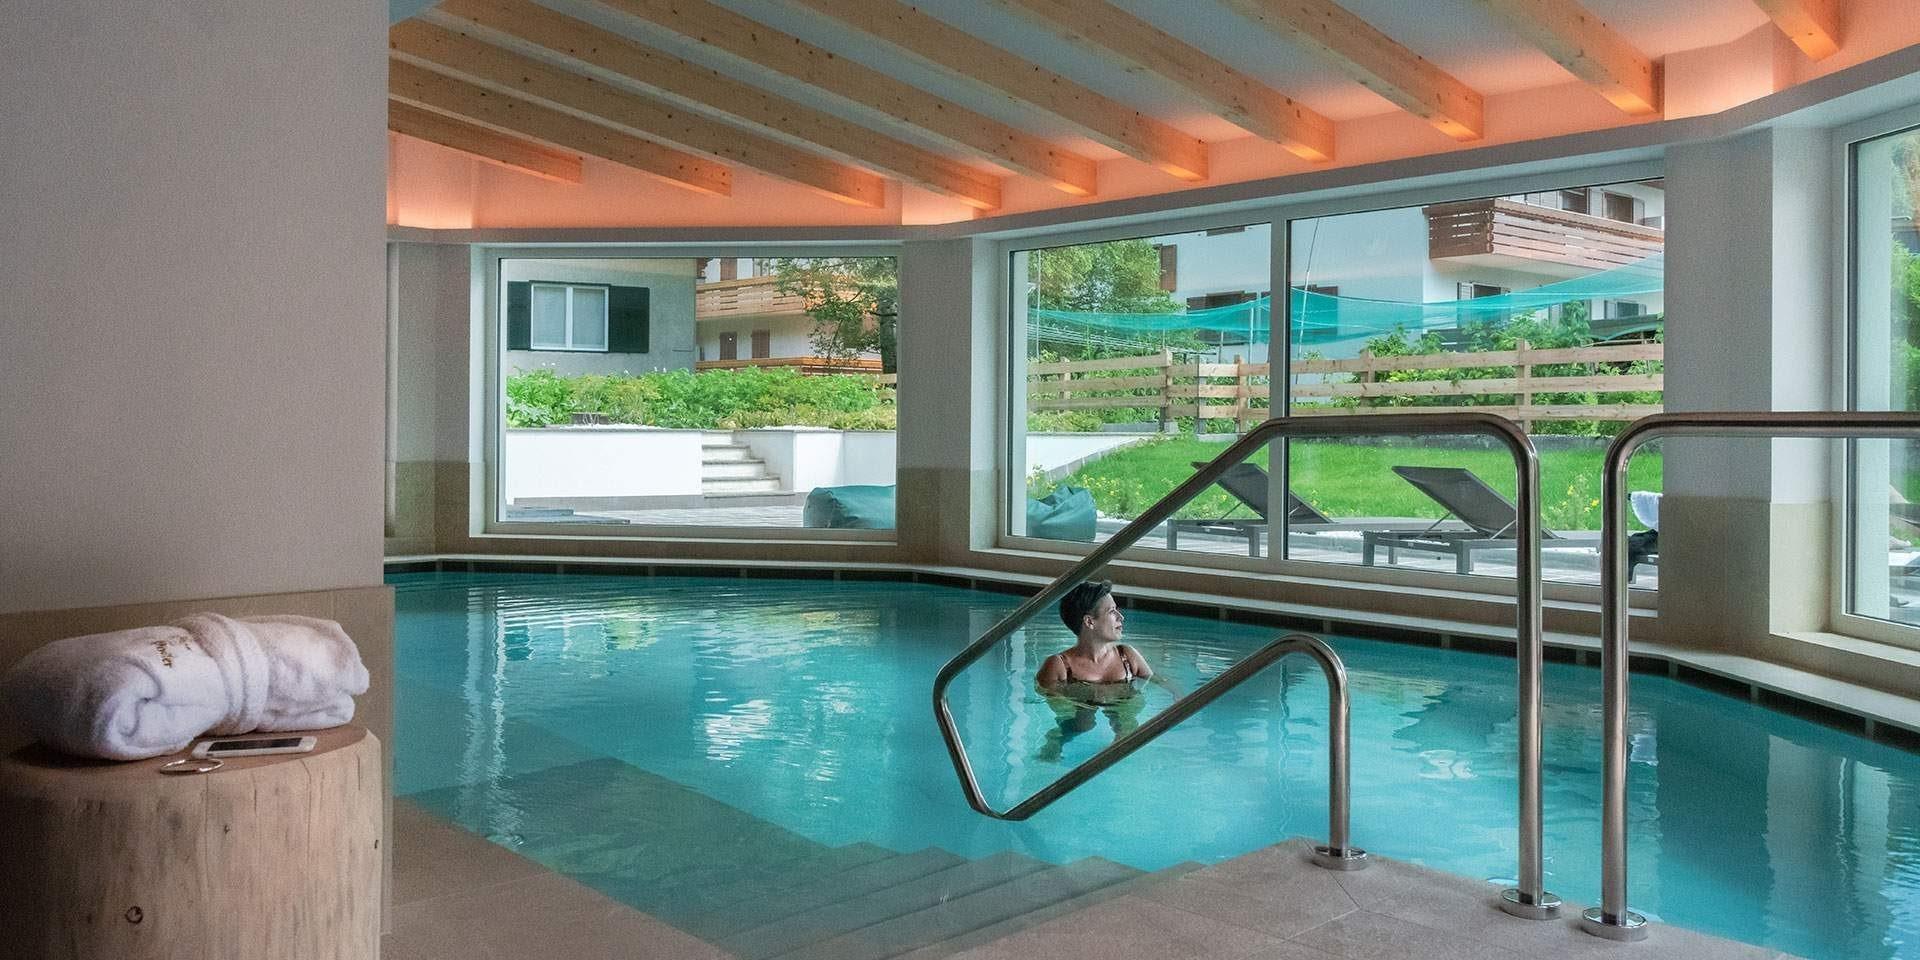 piscina whirlpool hotel el paster pera di fassa